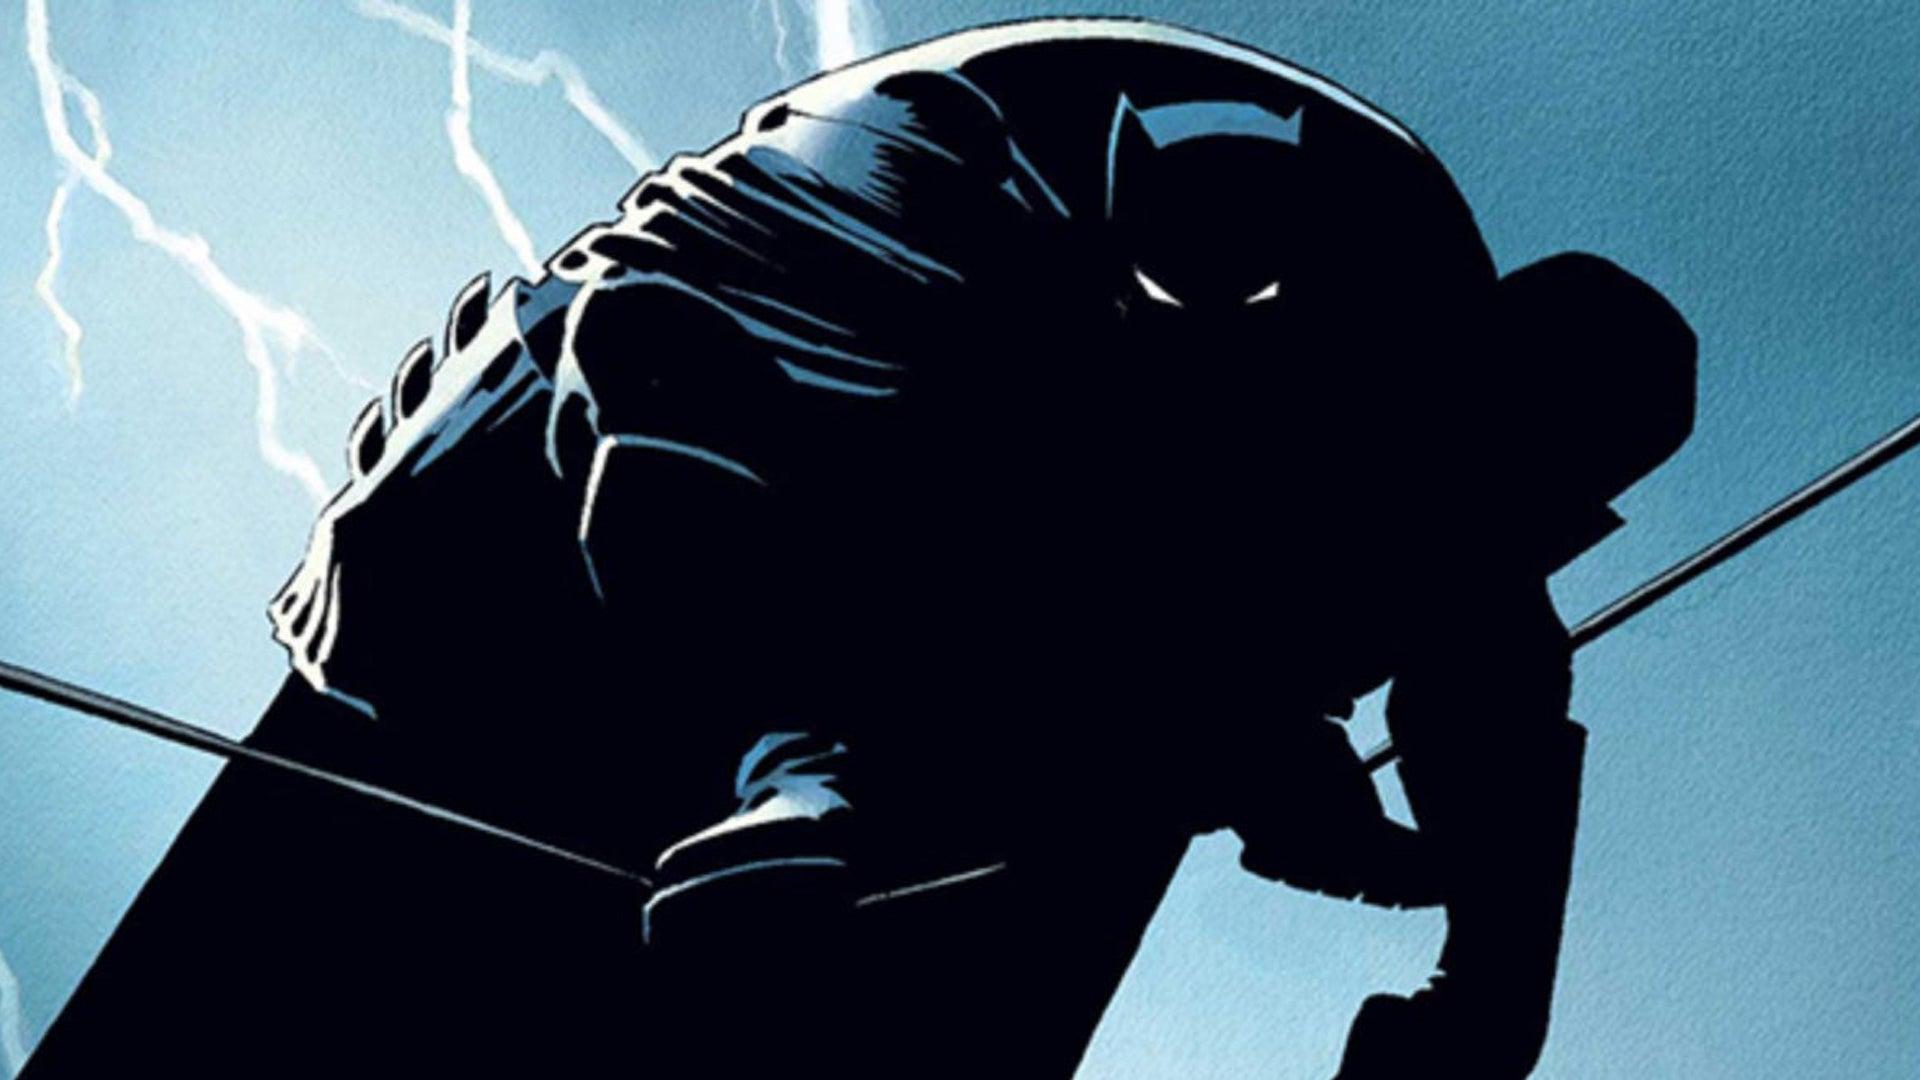 Batman: Dark Knight Returns comic cover